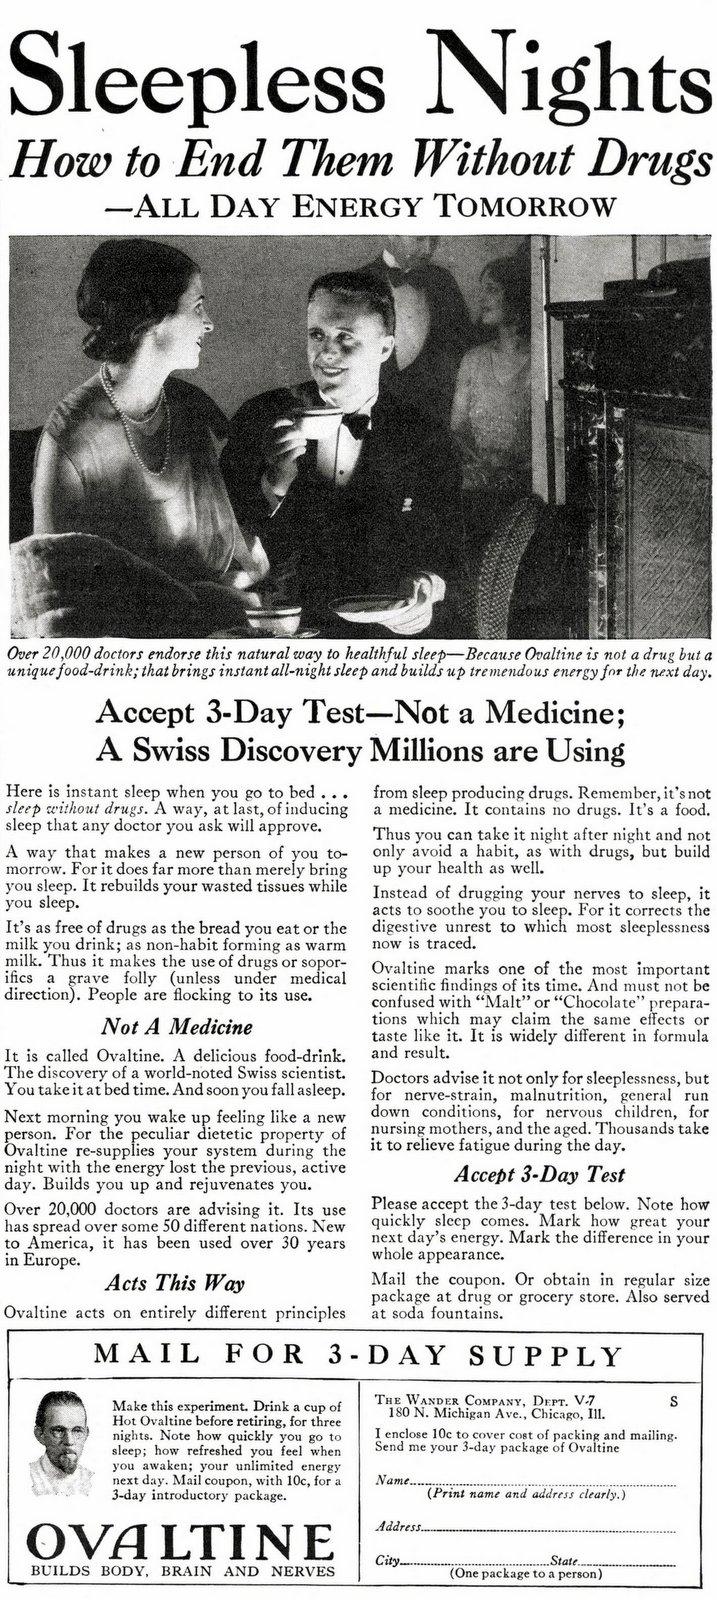 Ovaltine to end sleepless nights (1929)